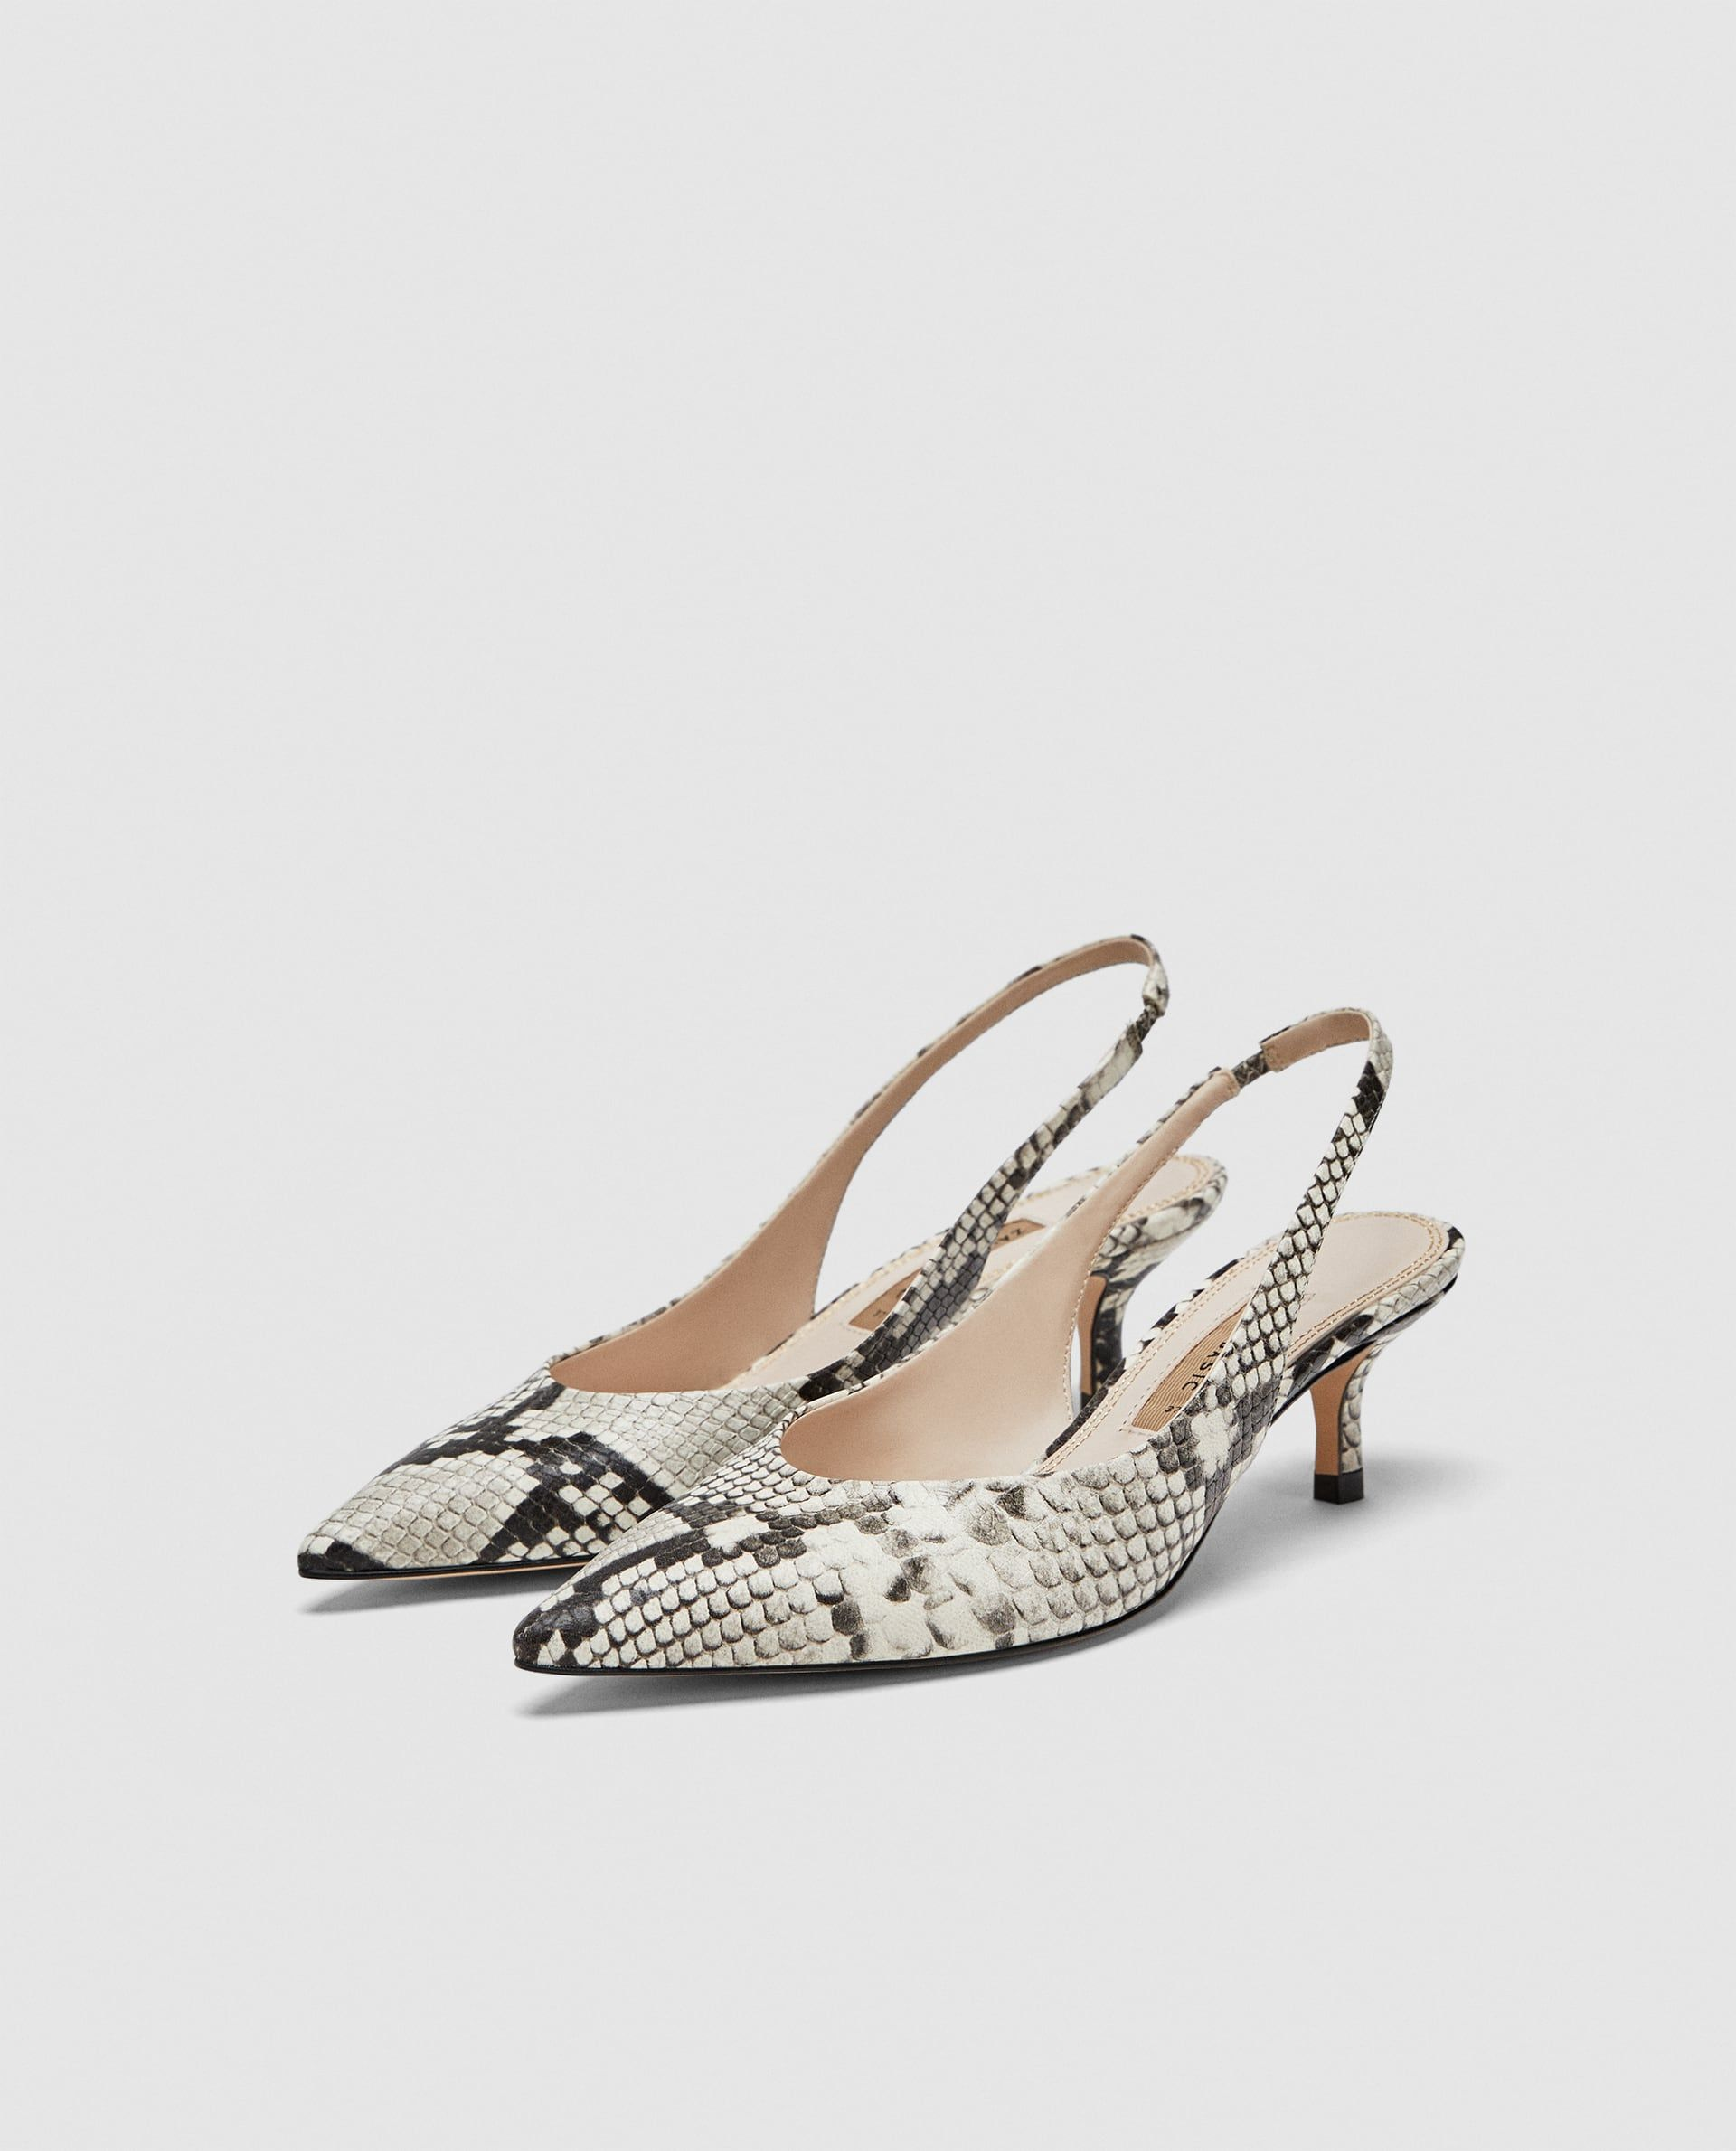 Leather Slingback Shoes Slingback Shoes Kitten Heel Shoes Work Shoes Women